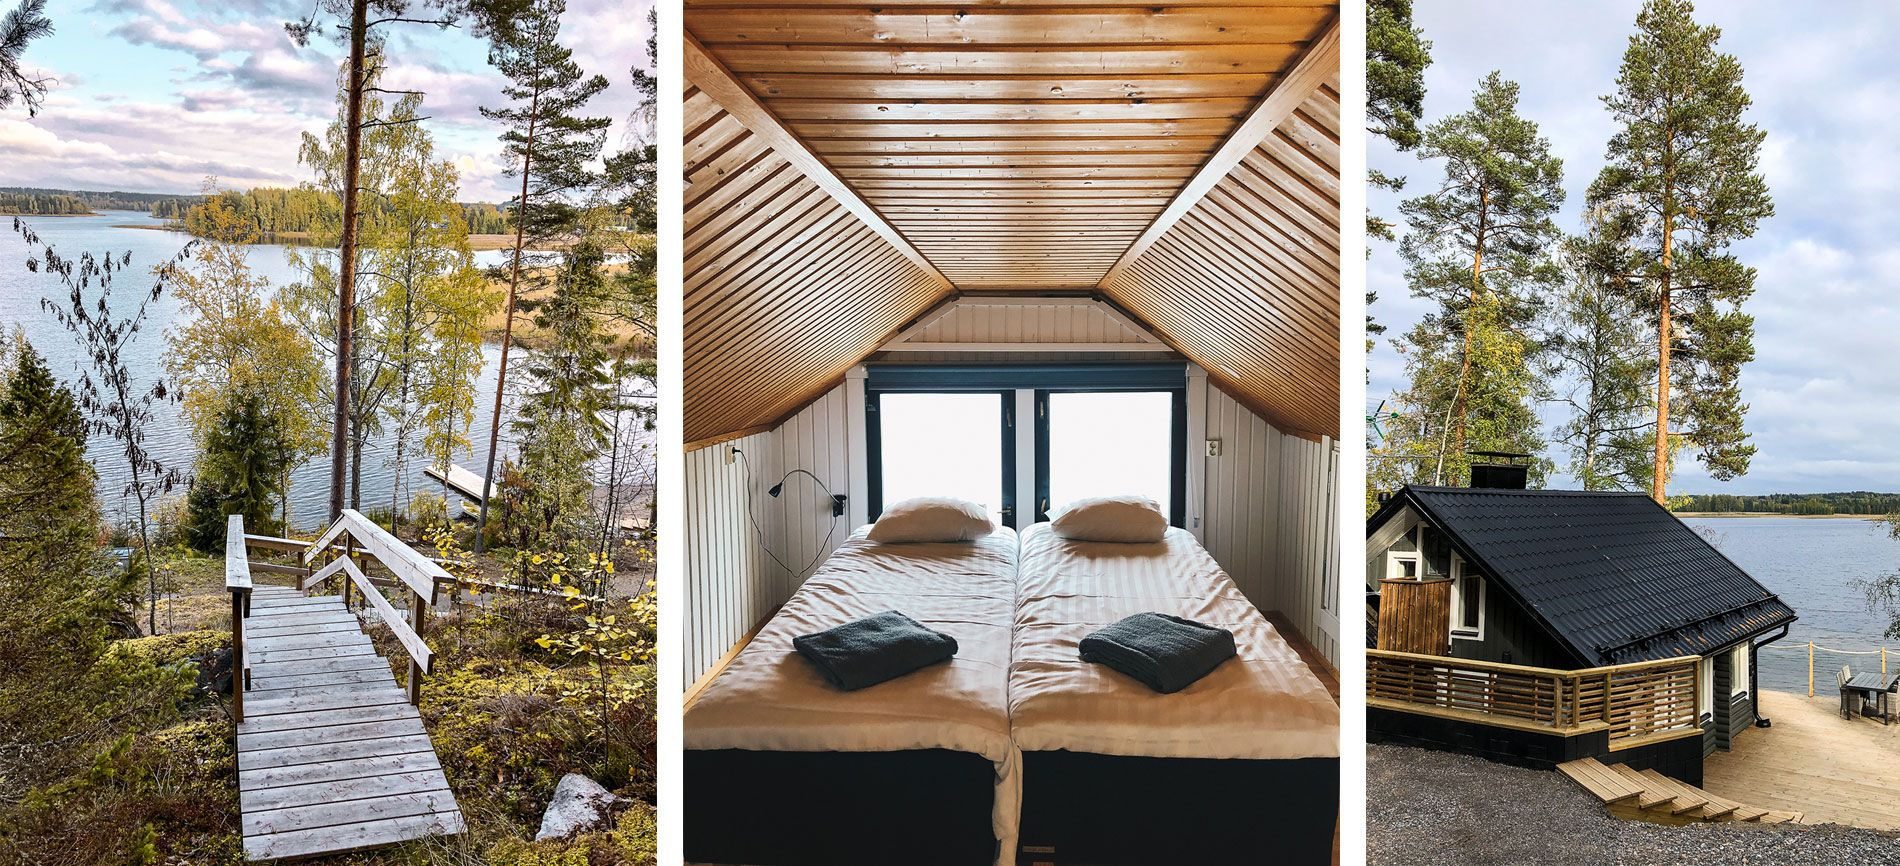 Construire Un Sauna Finlandais la finlande à l'automne   jyväskylä & lahti   région des